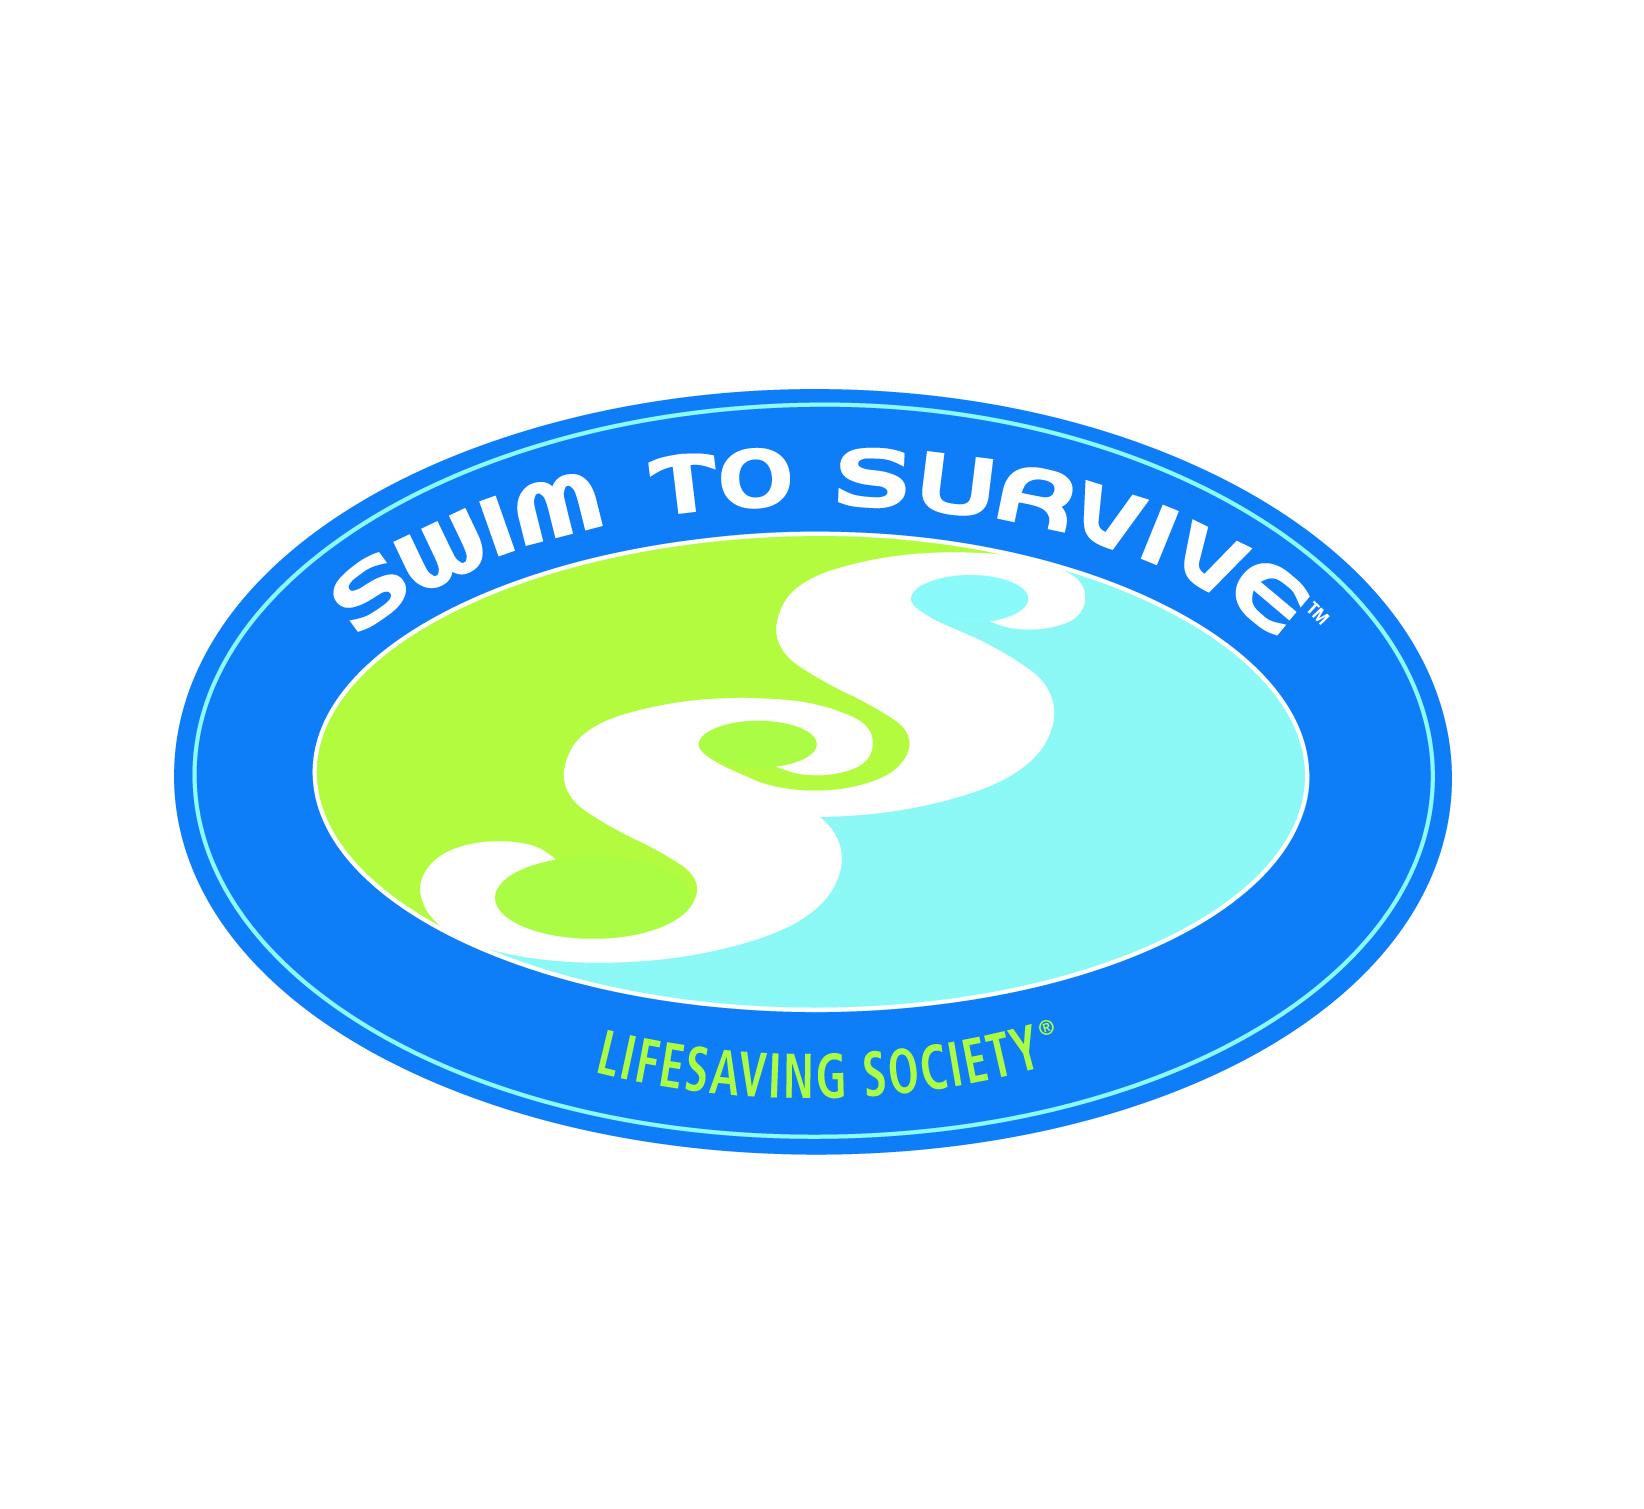 lifesaving society logos